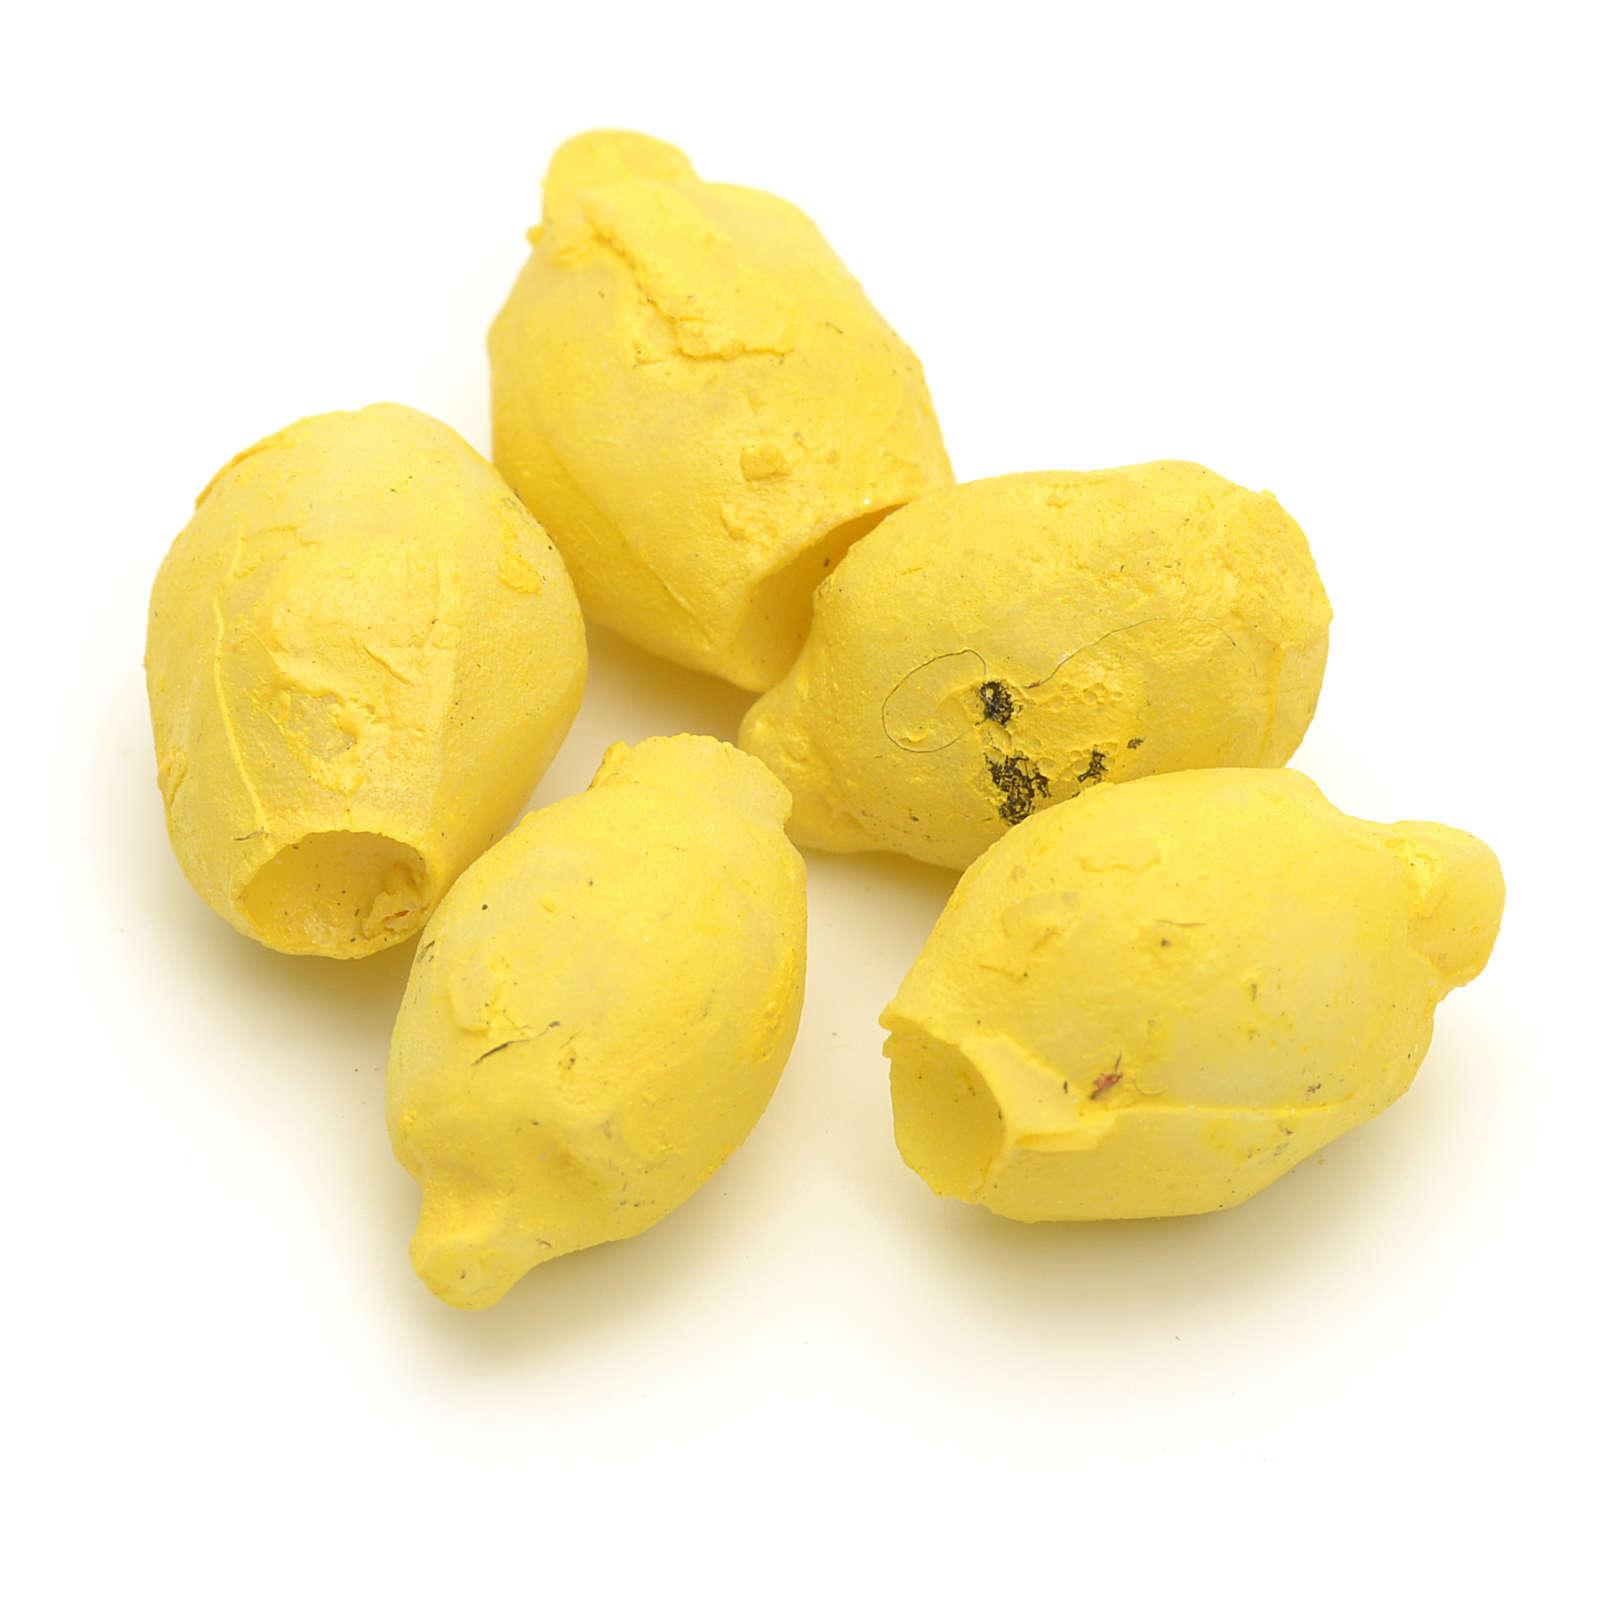 Limones pesebre hecho por ti 5 pz 4